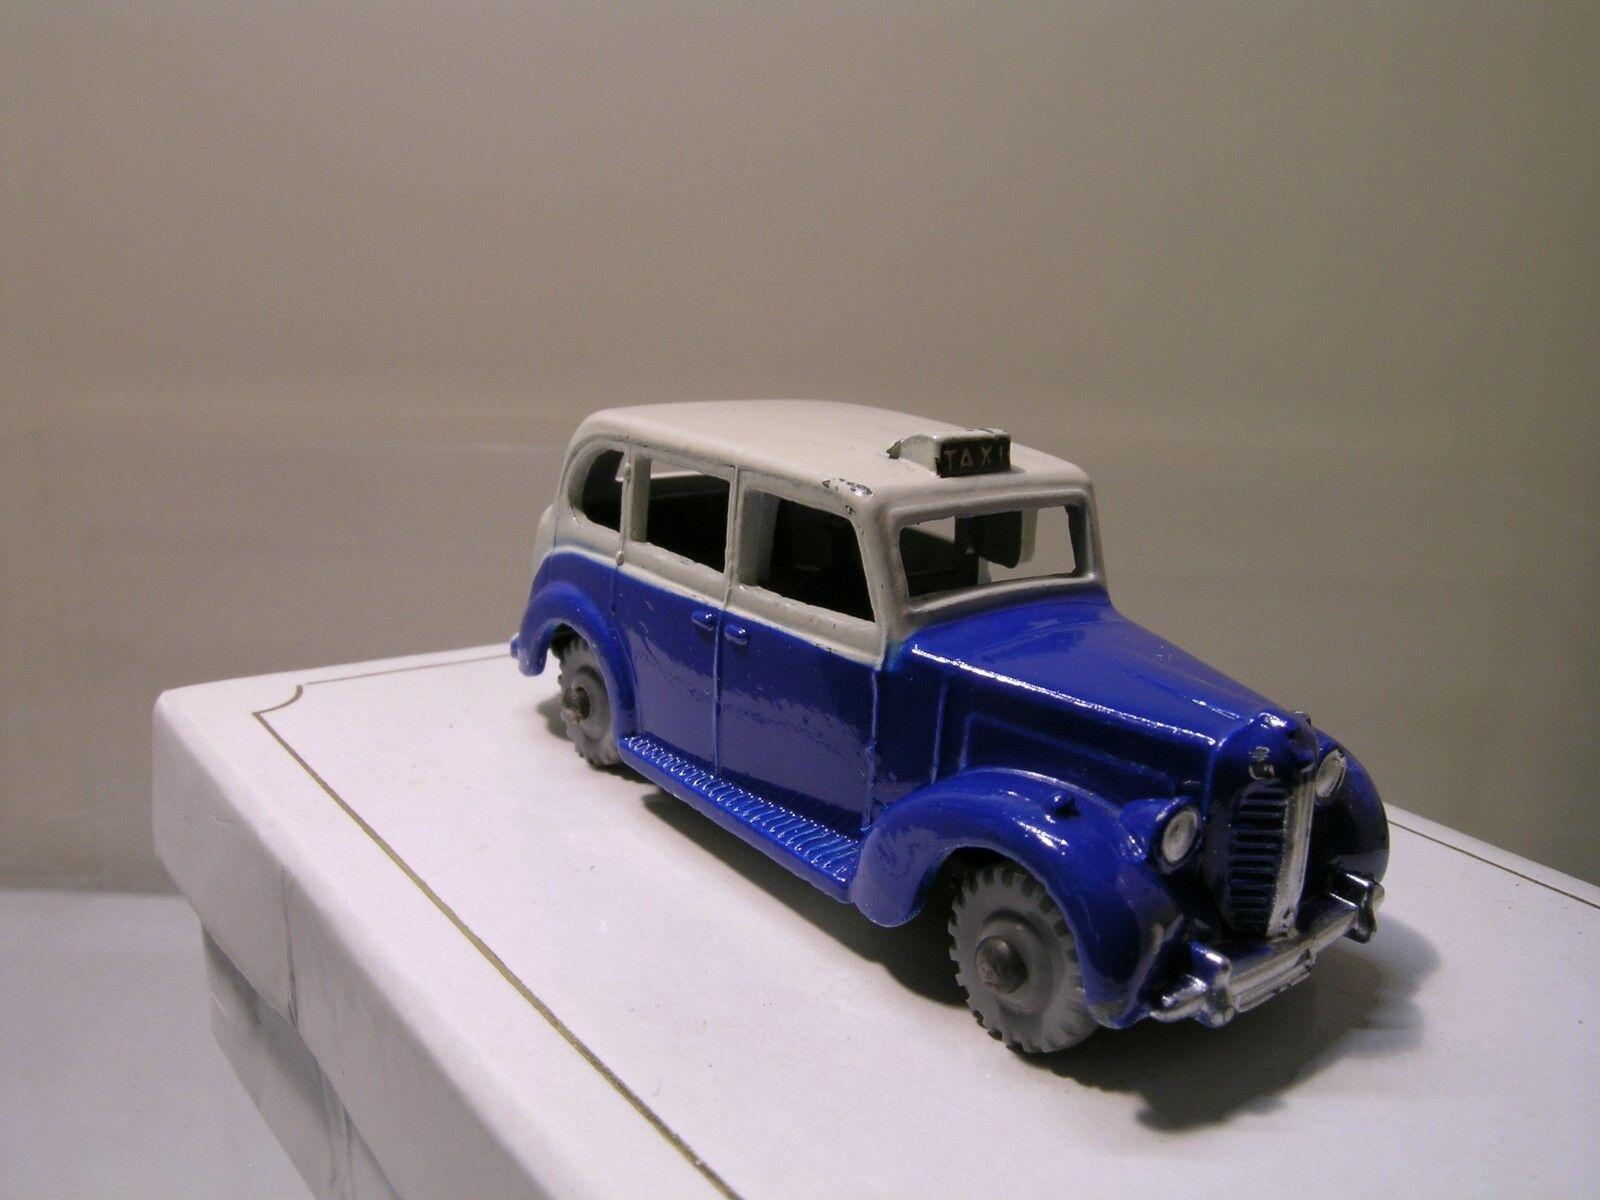 DINKY TOYS DUBLO AUSTIN TAXI FX3 1959 blueE CREAM SCALE SCALE SCALE 00   1 76 1daf3a